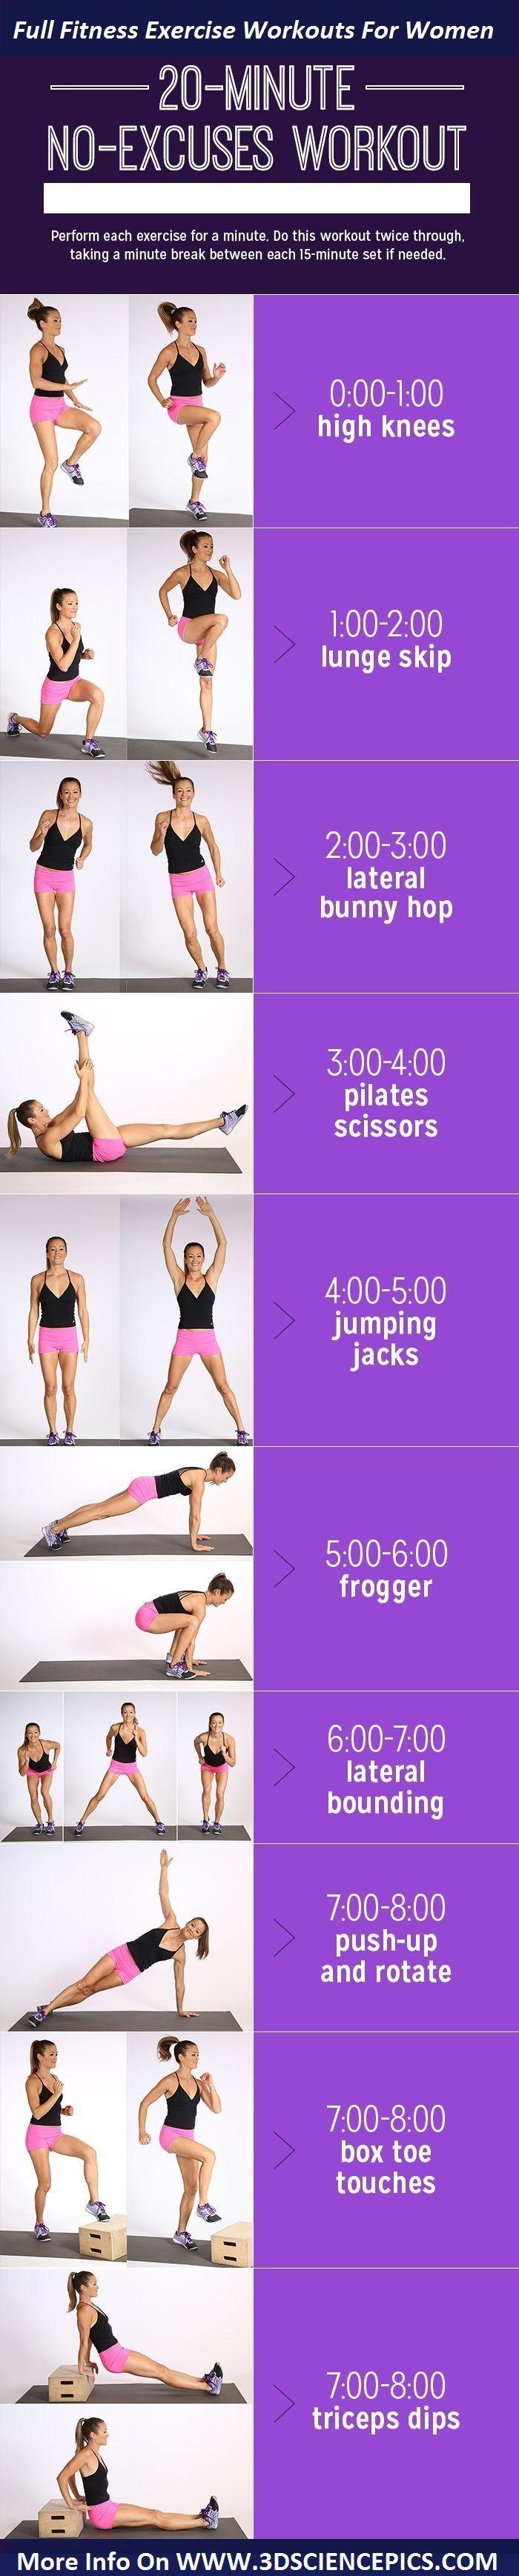 www.littlevendorathletics.com Fitness Workouts For Women Everyday Exercises